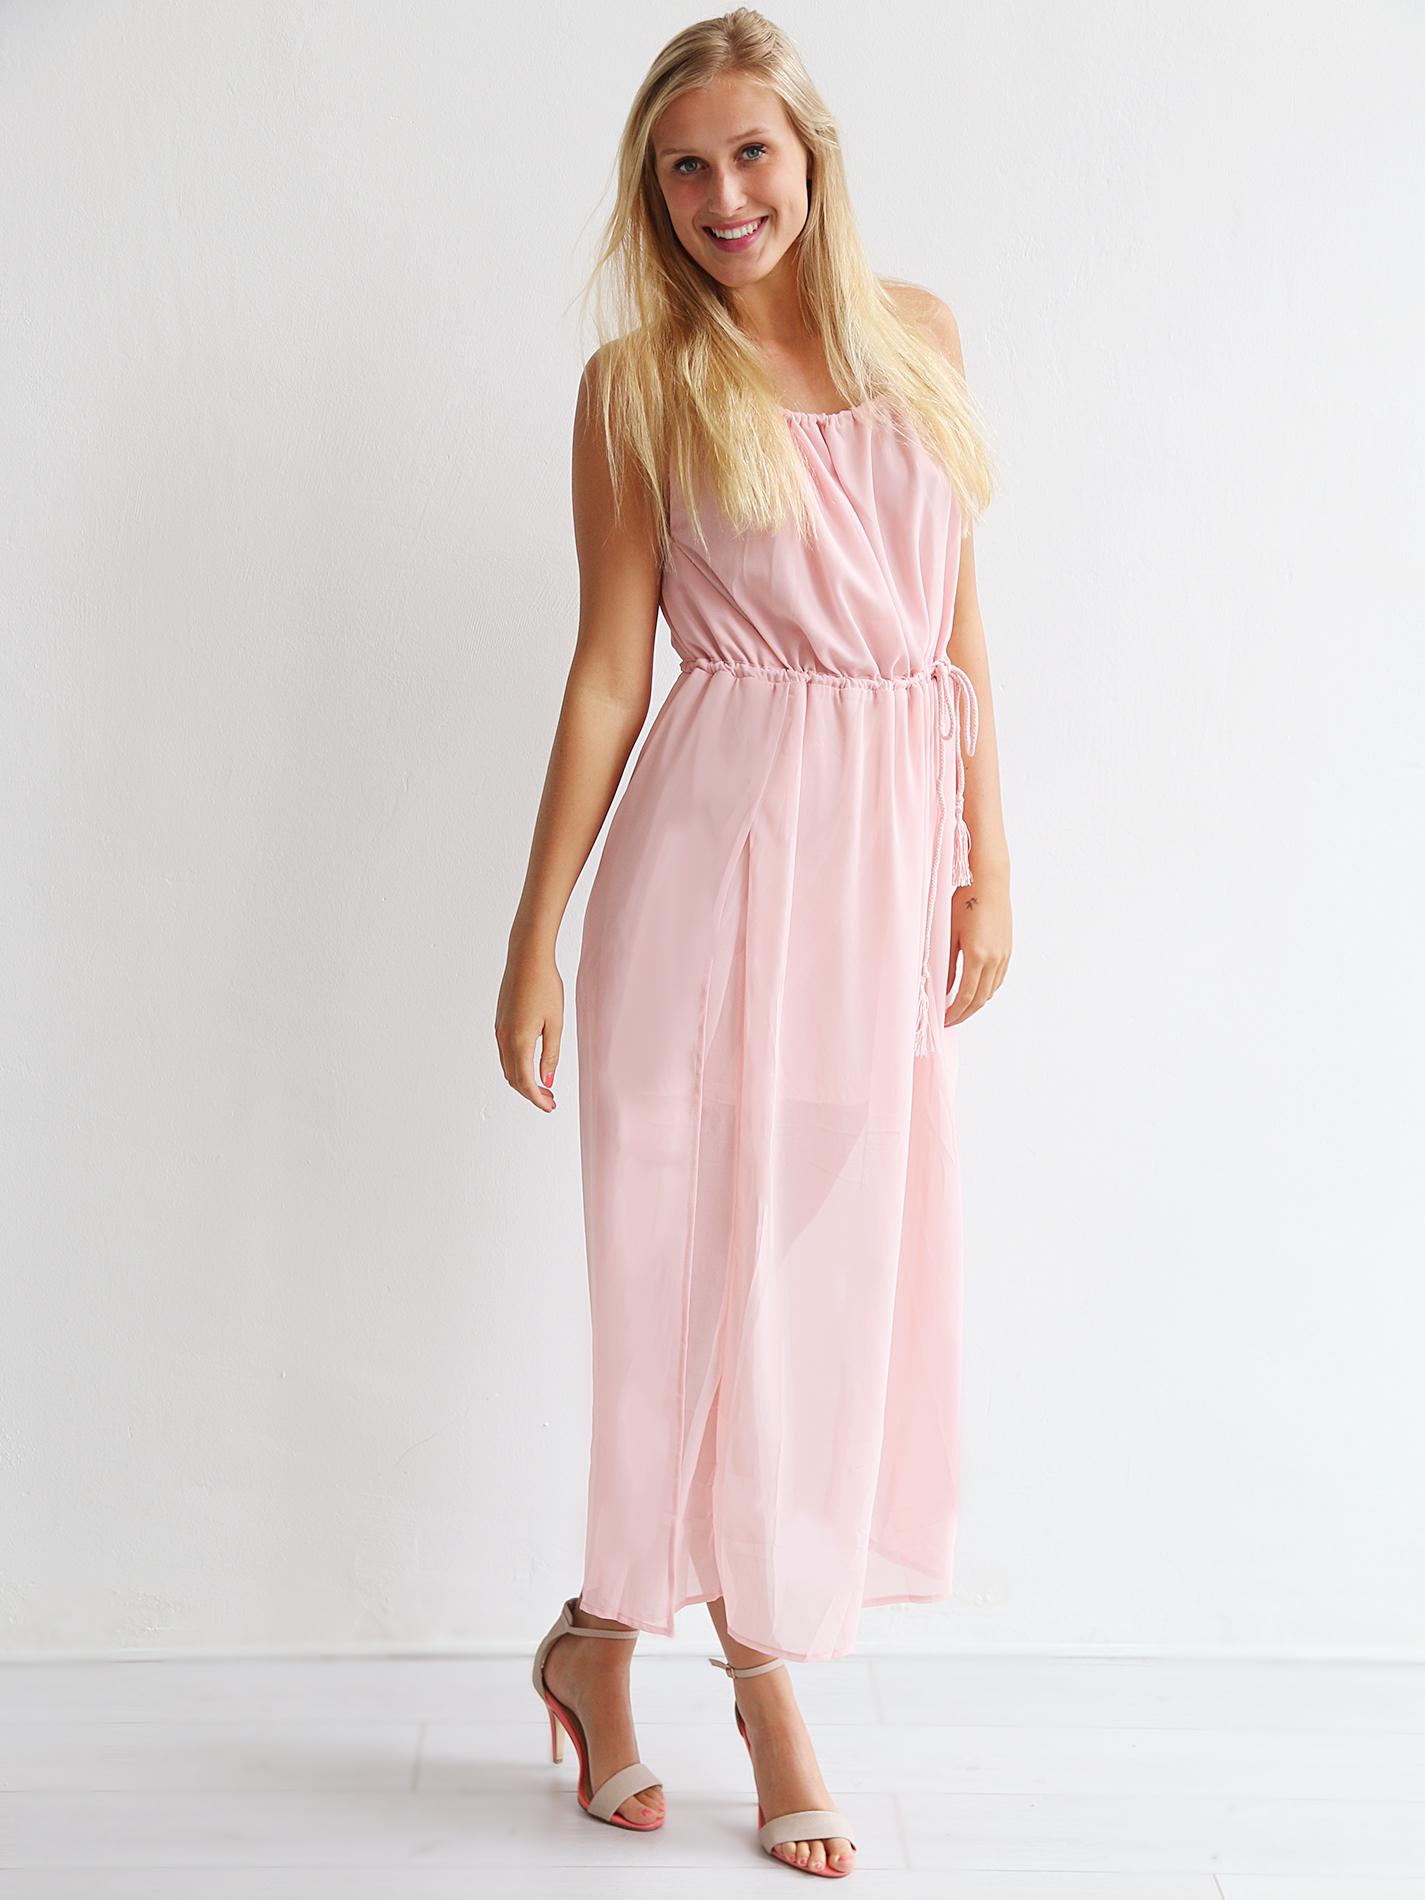 Roze Maxi Jurk.8 X Musthave Maxi Dresses Follow Fashion